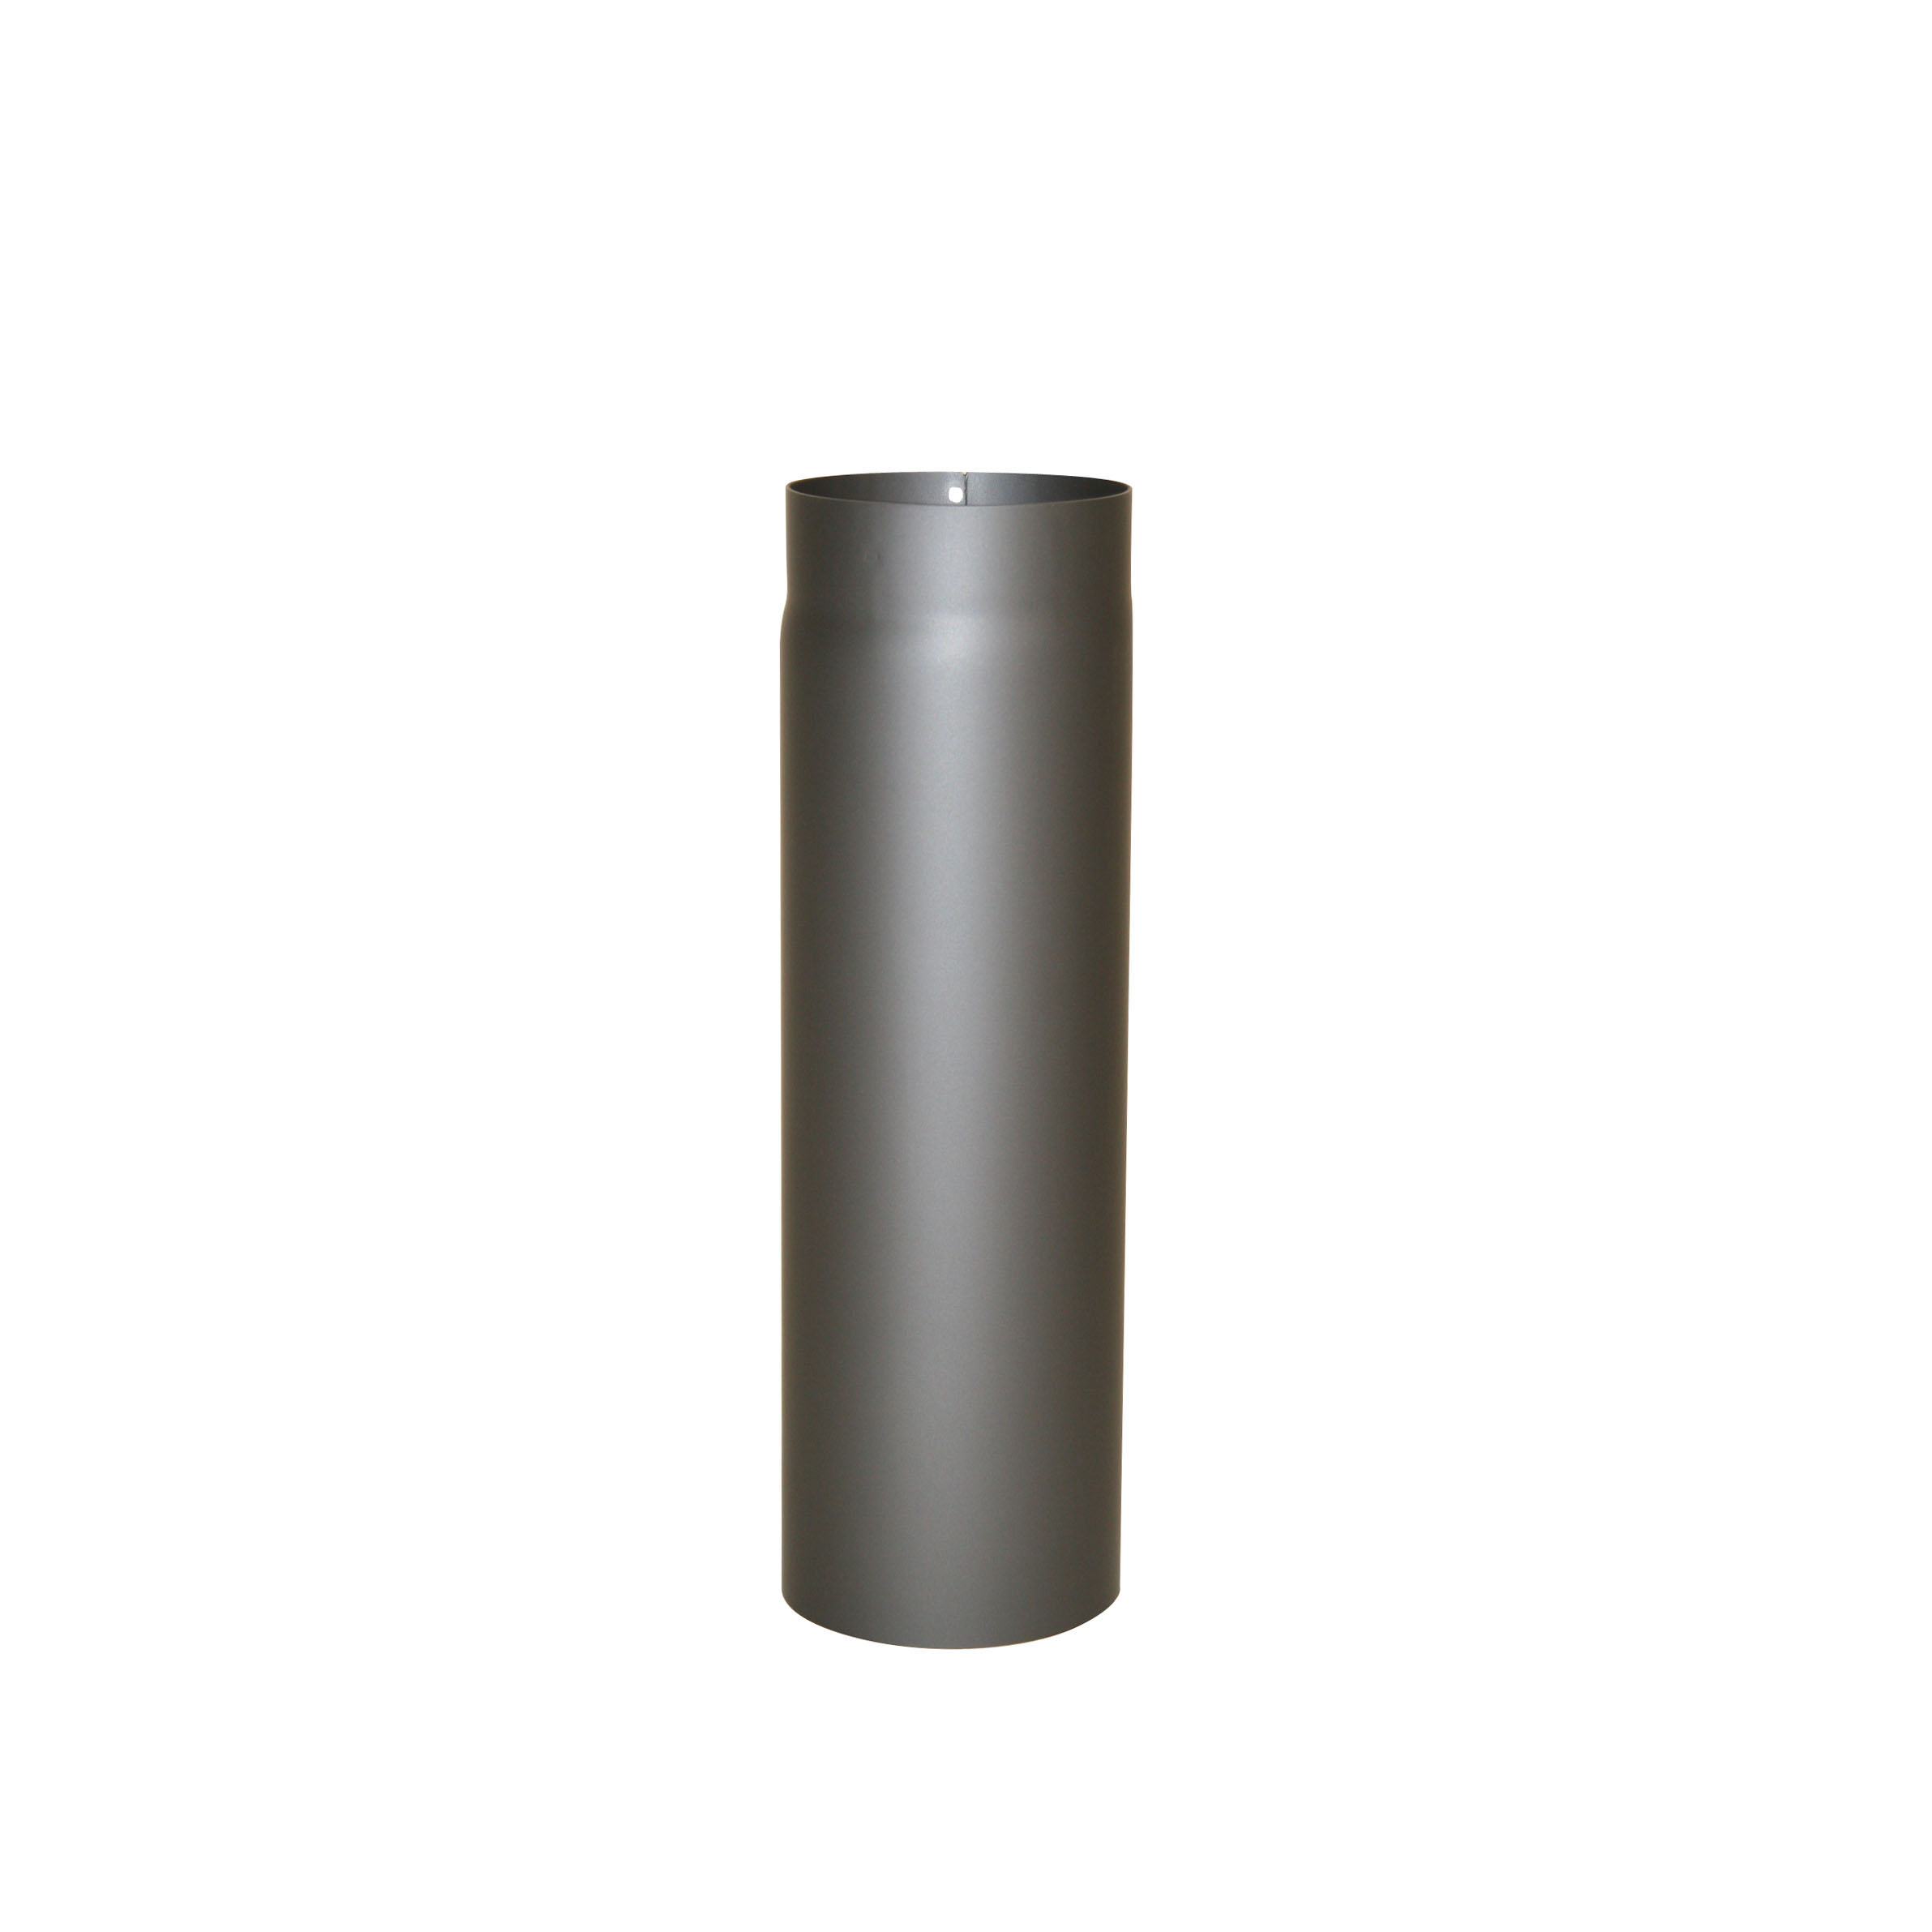 ofenrohr 150mm rauchrohr 2mm kaminrohr bogen rosette knie wandfutter rohrhalter ebay. Black Bedroom Furniture Sets. Home Design Ideas